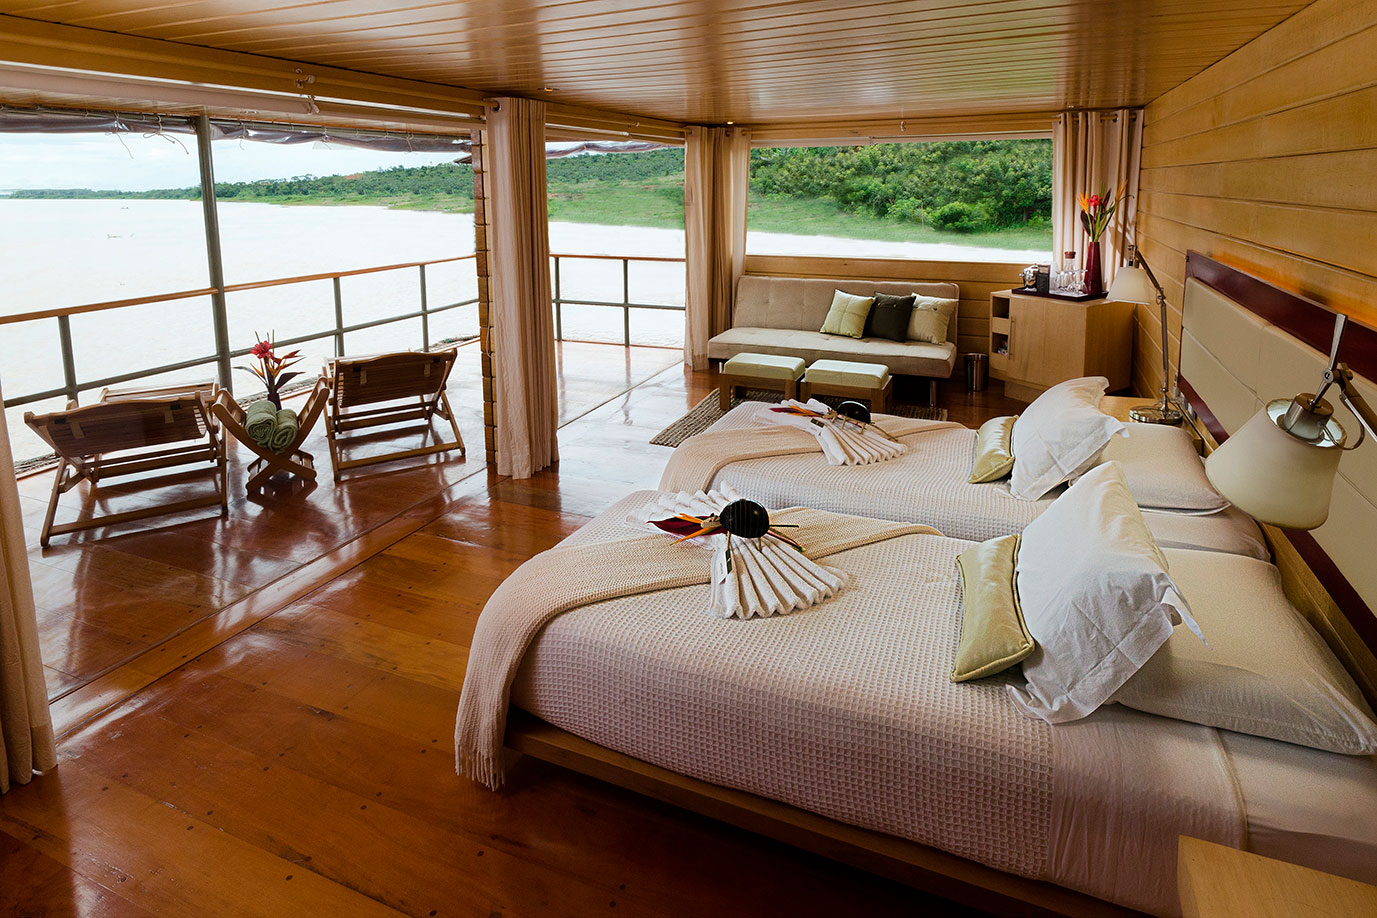 Master Suites Aboard the Delfin I Amazon Cruise